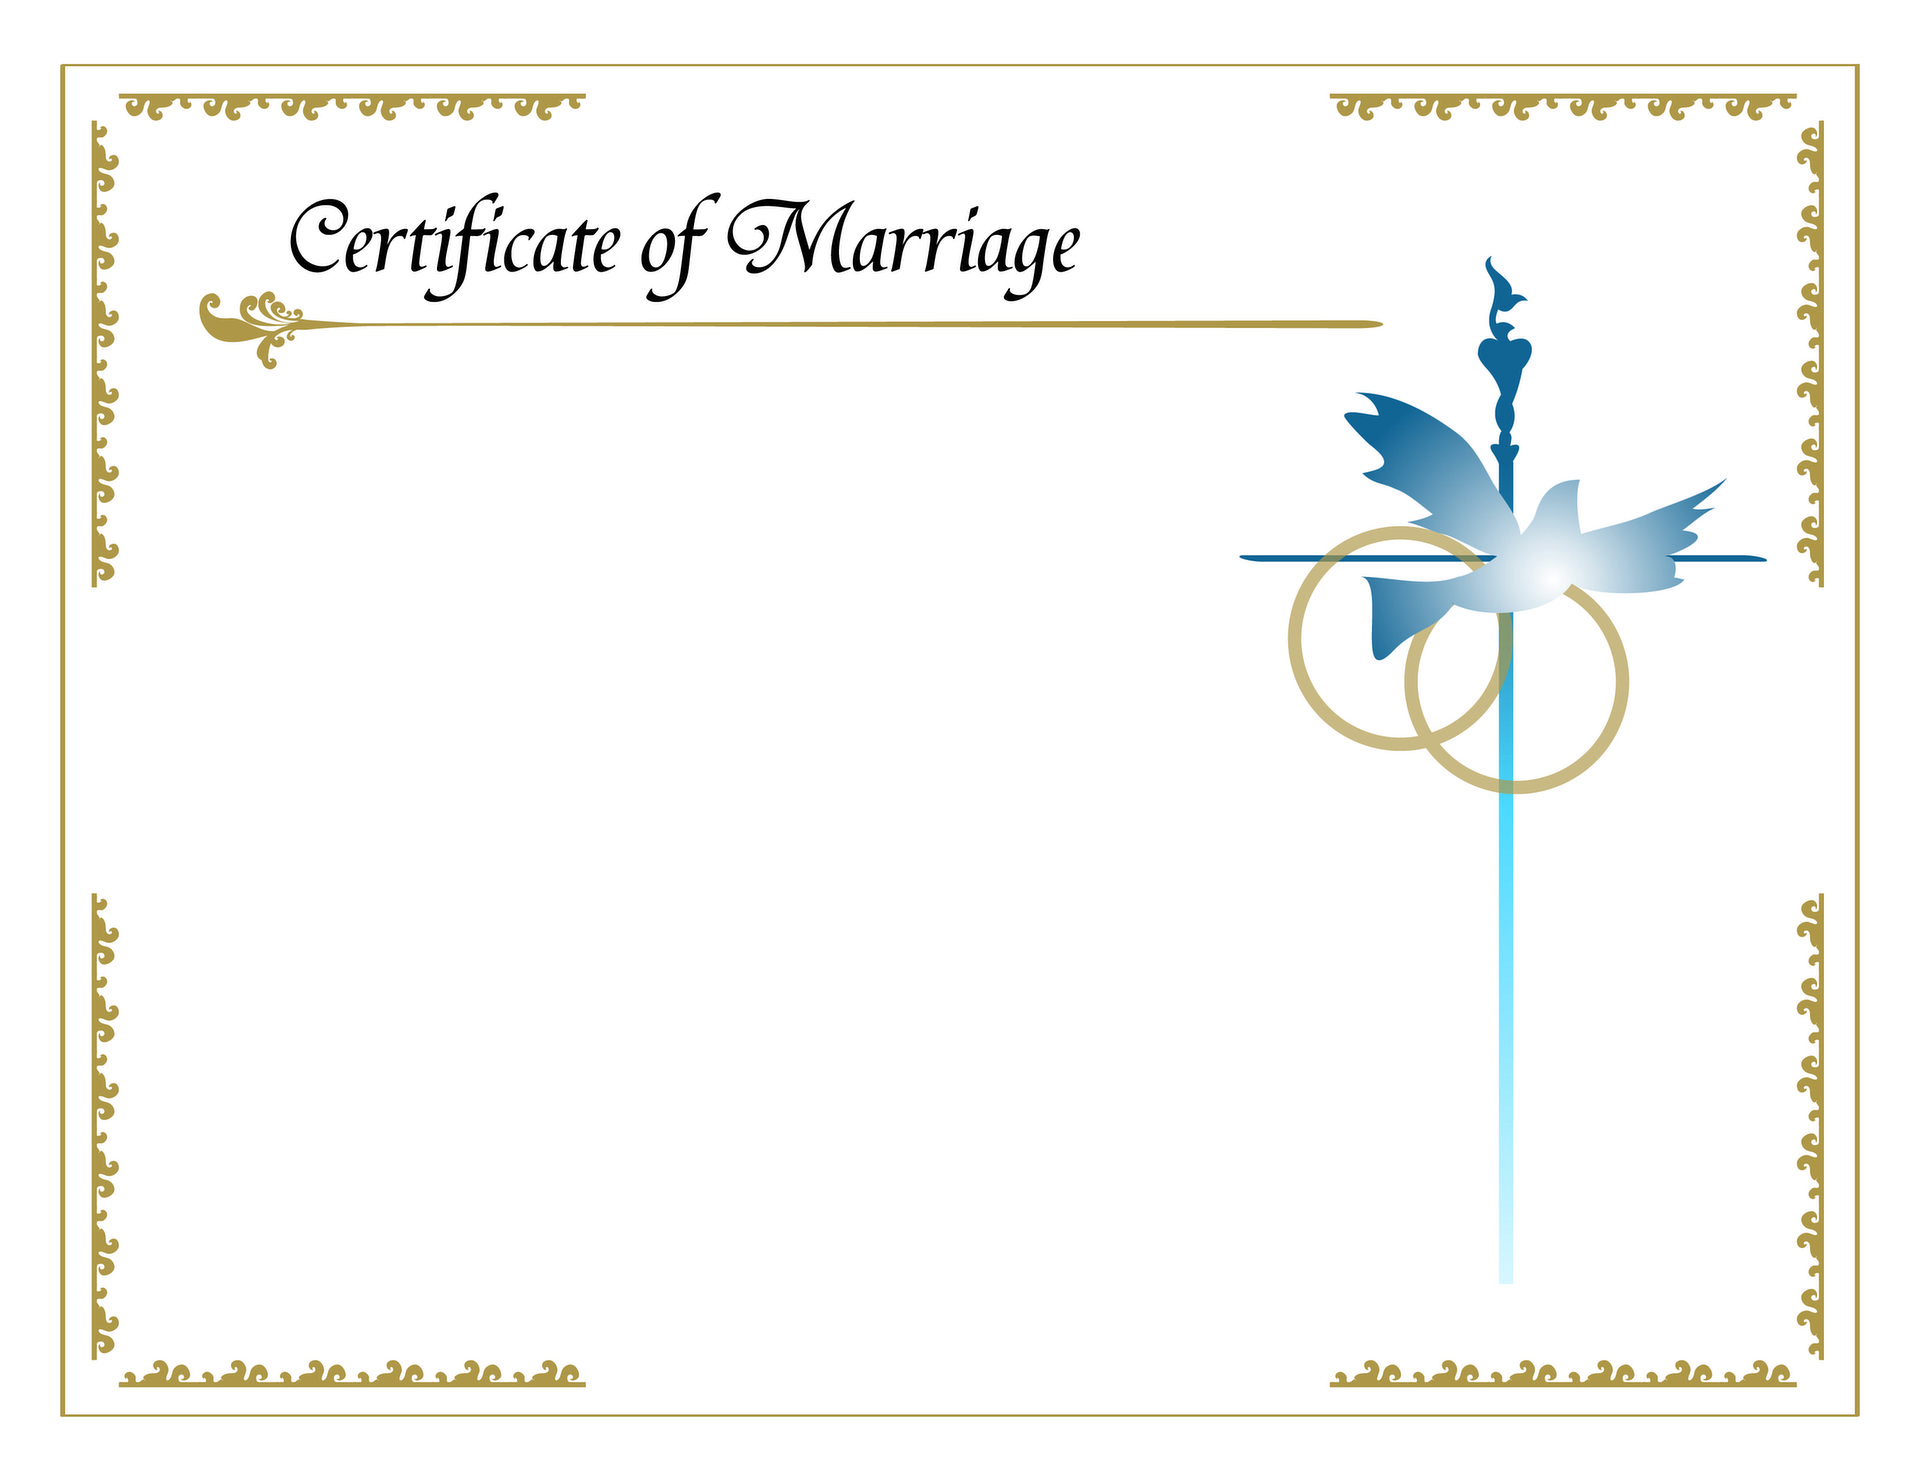 Natalia Ricotta | Marriage Certificate Design